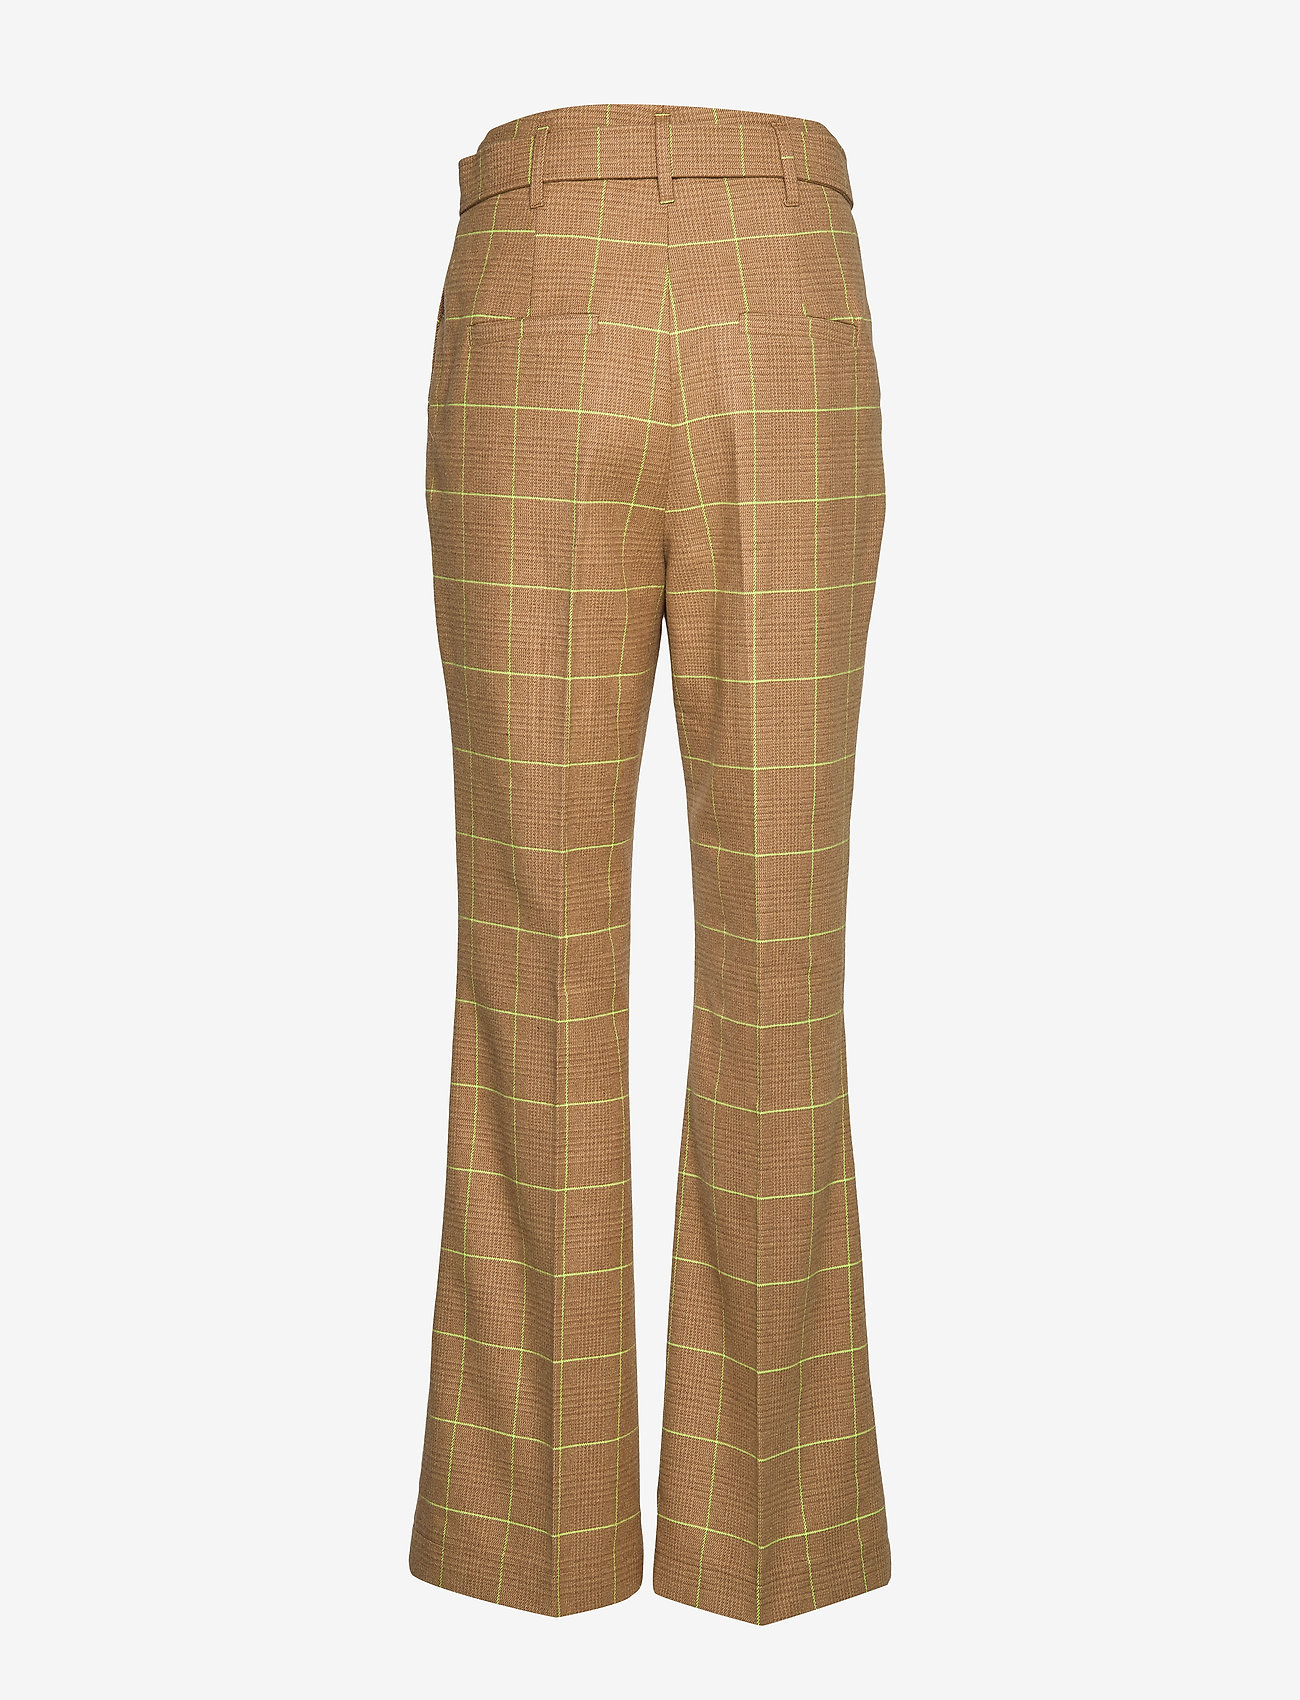 Note Pants (Camel Checks) - Birgitte Herskind pAqFb3